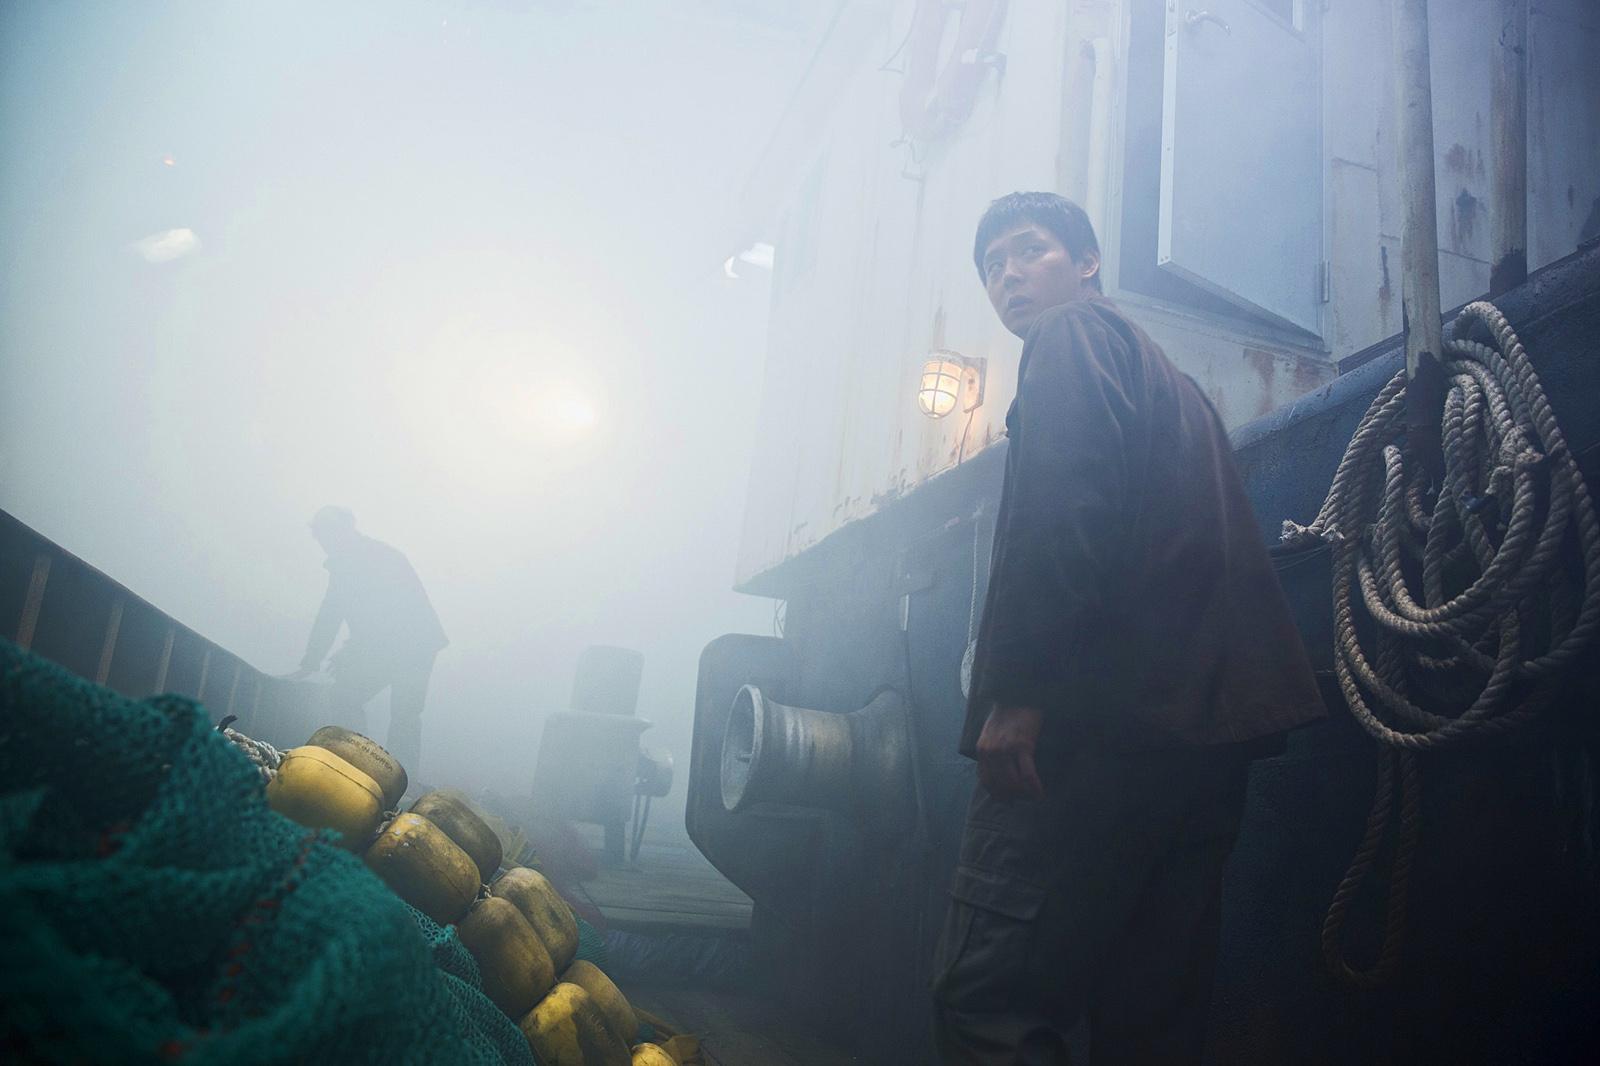 Sea-Fog-Les-Clandestins-Image-1